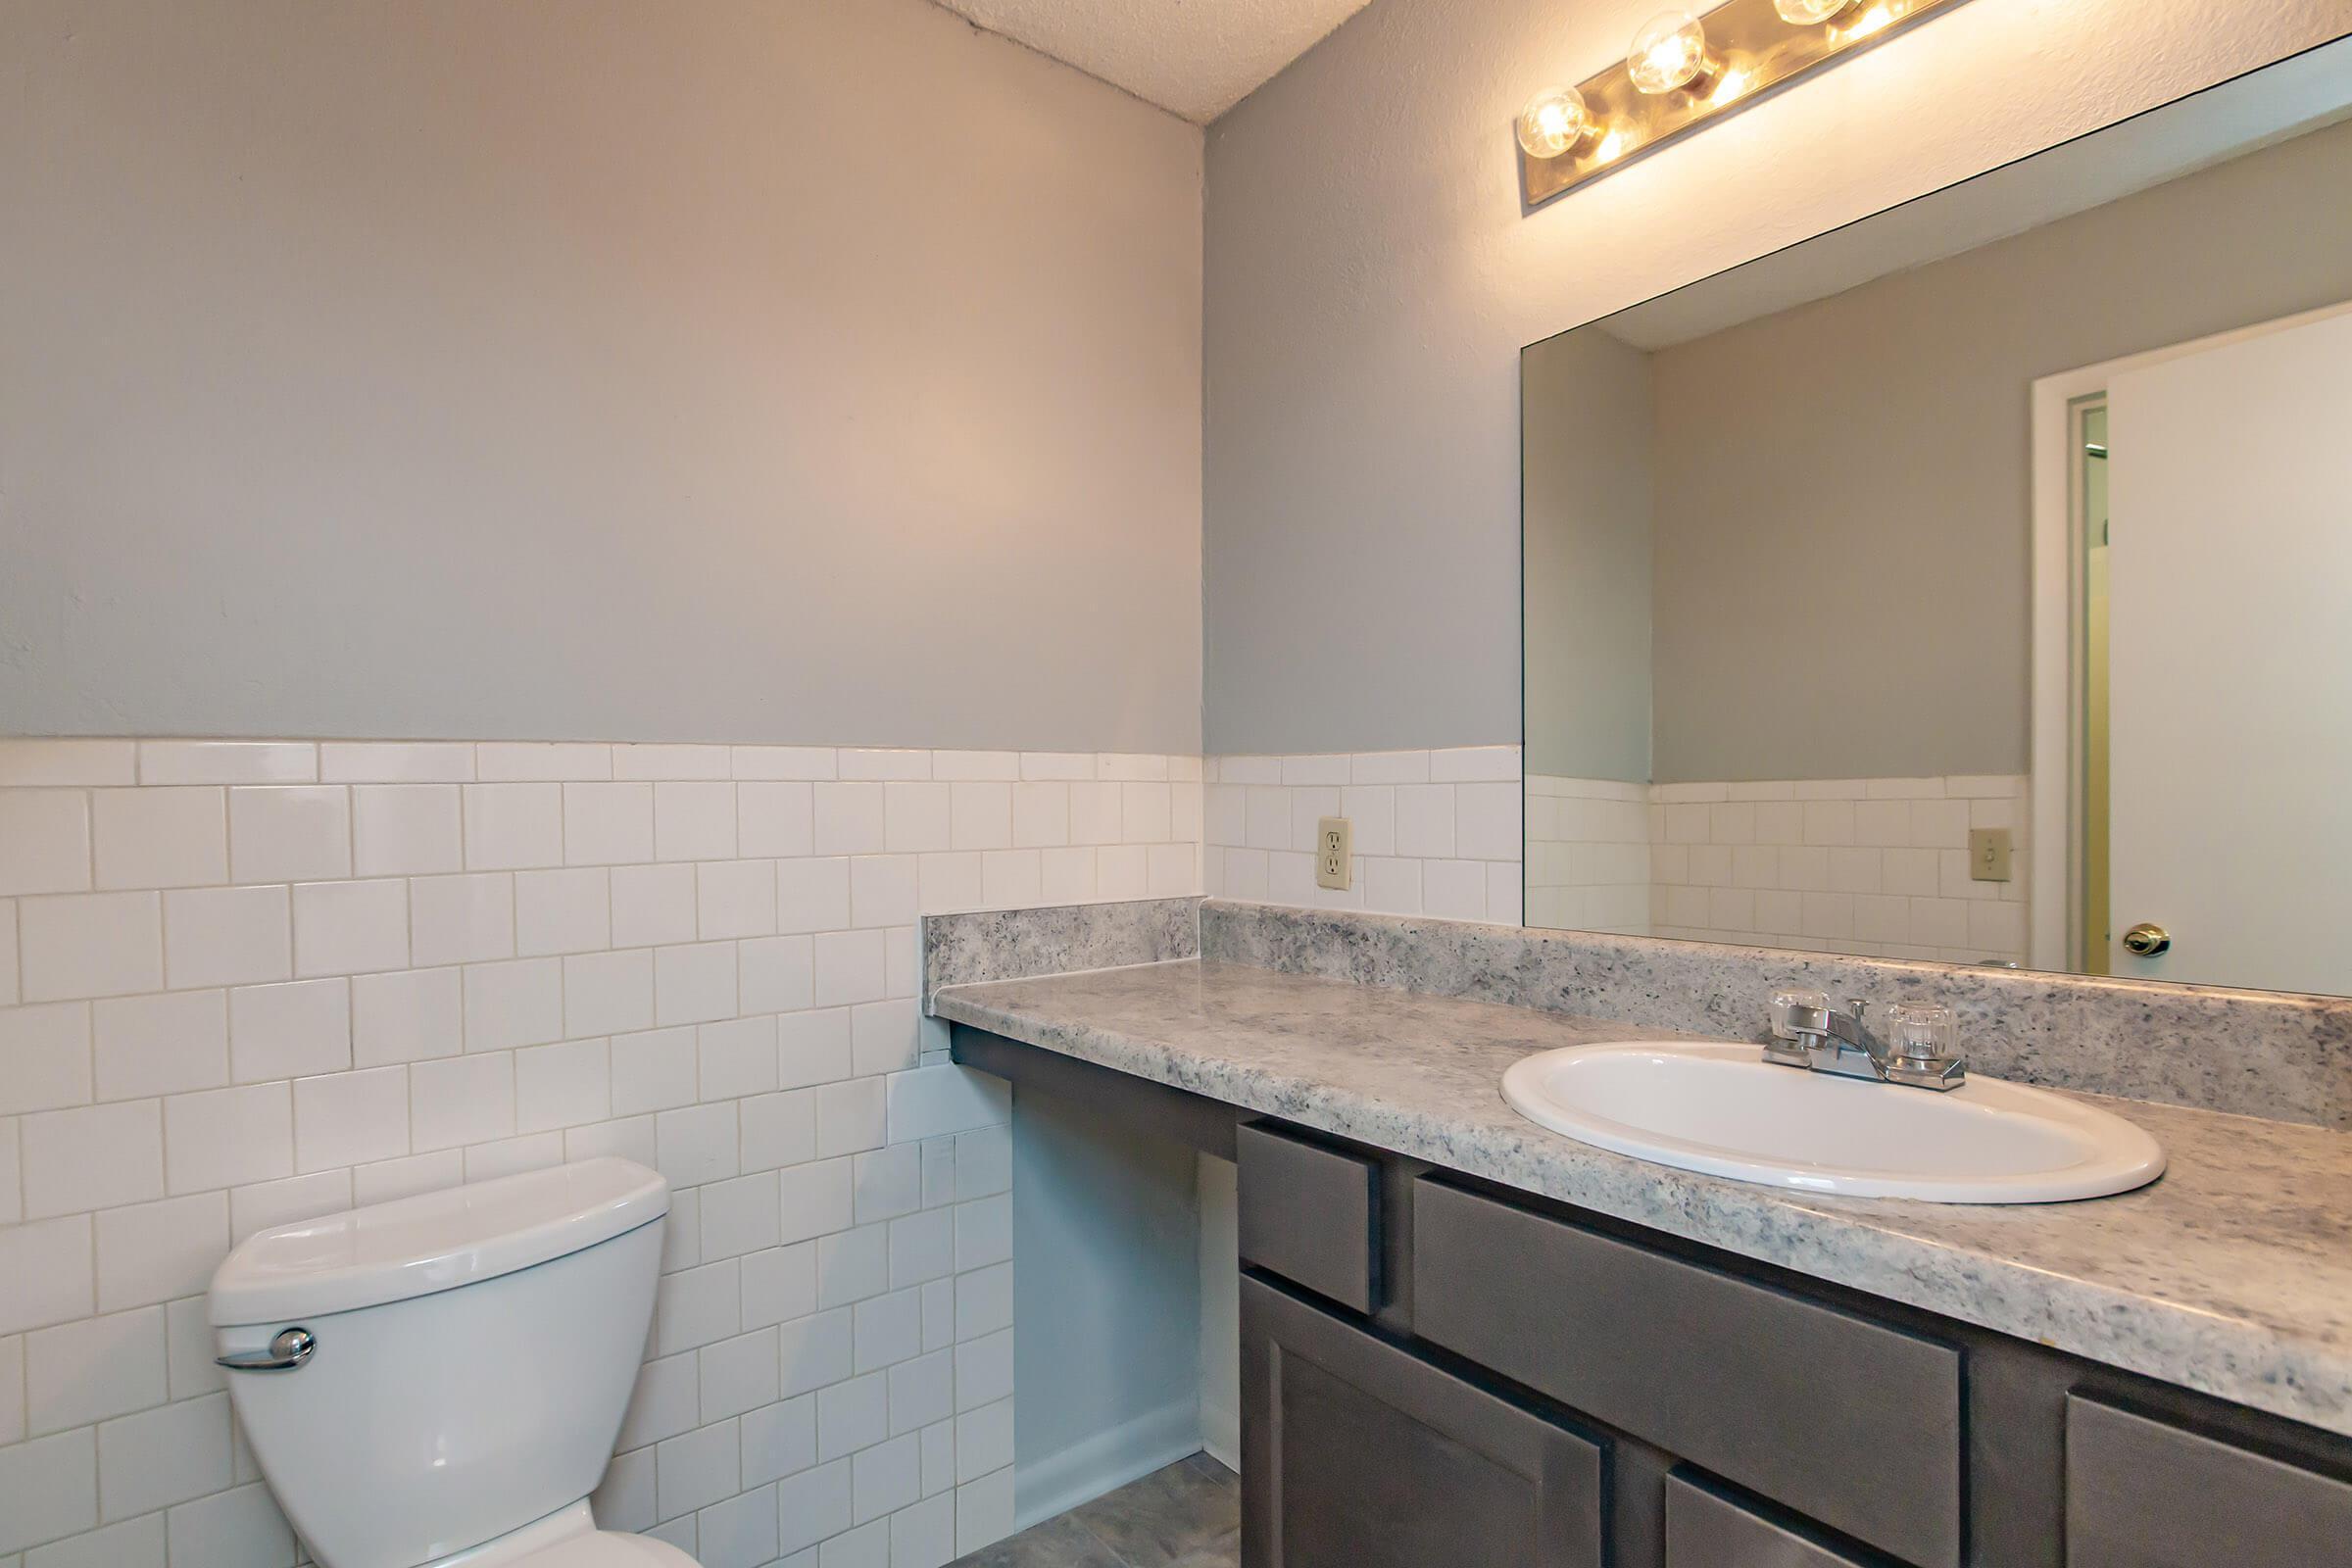 Spacious countertops in bathroom